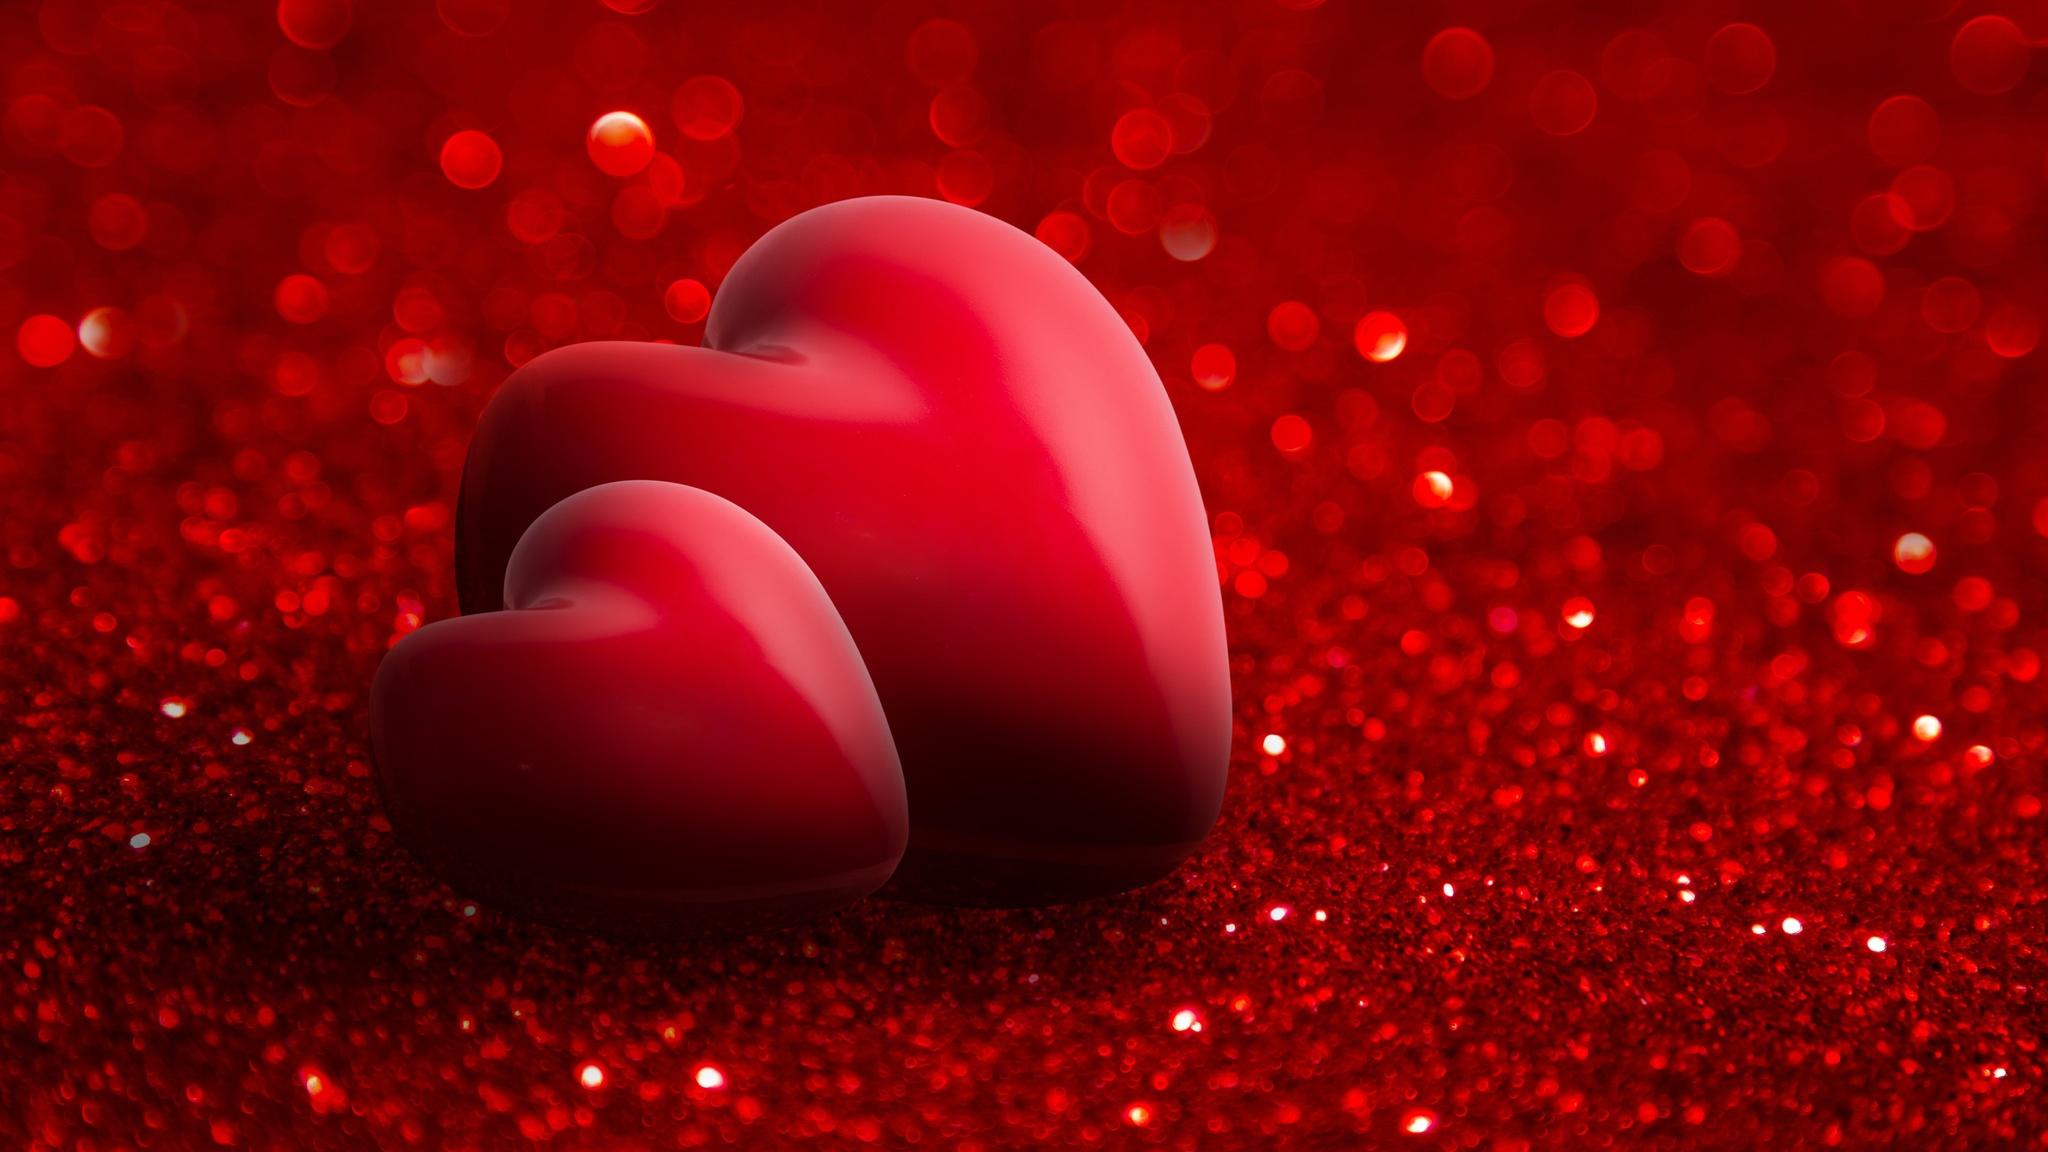 2048x1152 Love Heart 4k 2048x1152 Resolution Hd 4k